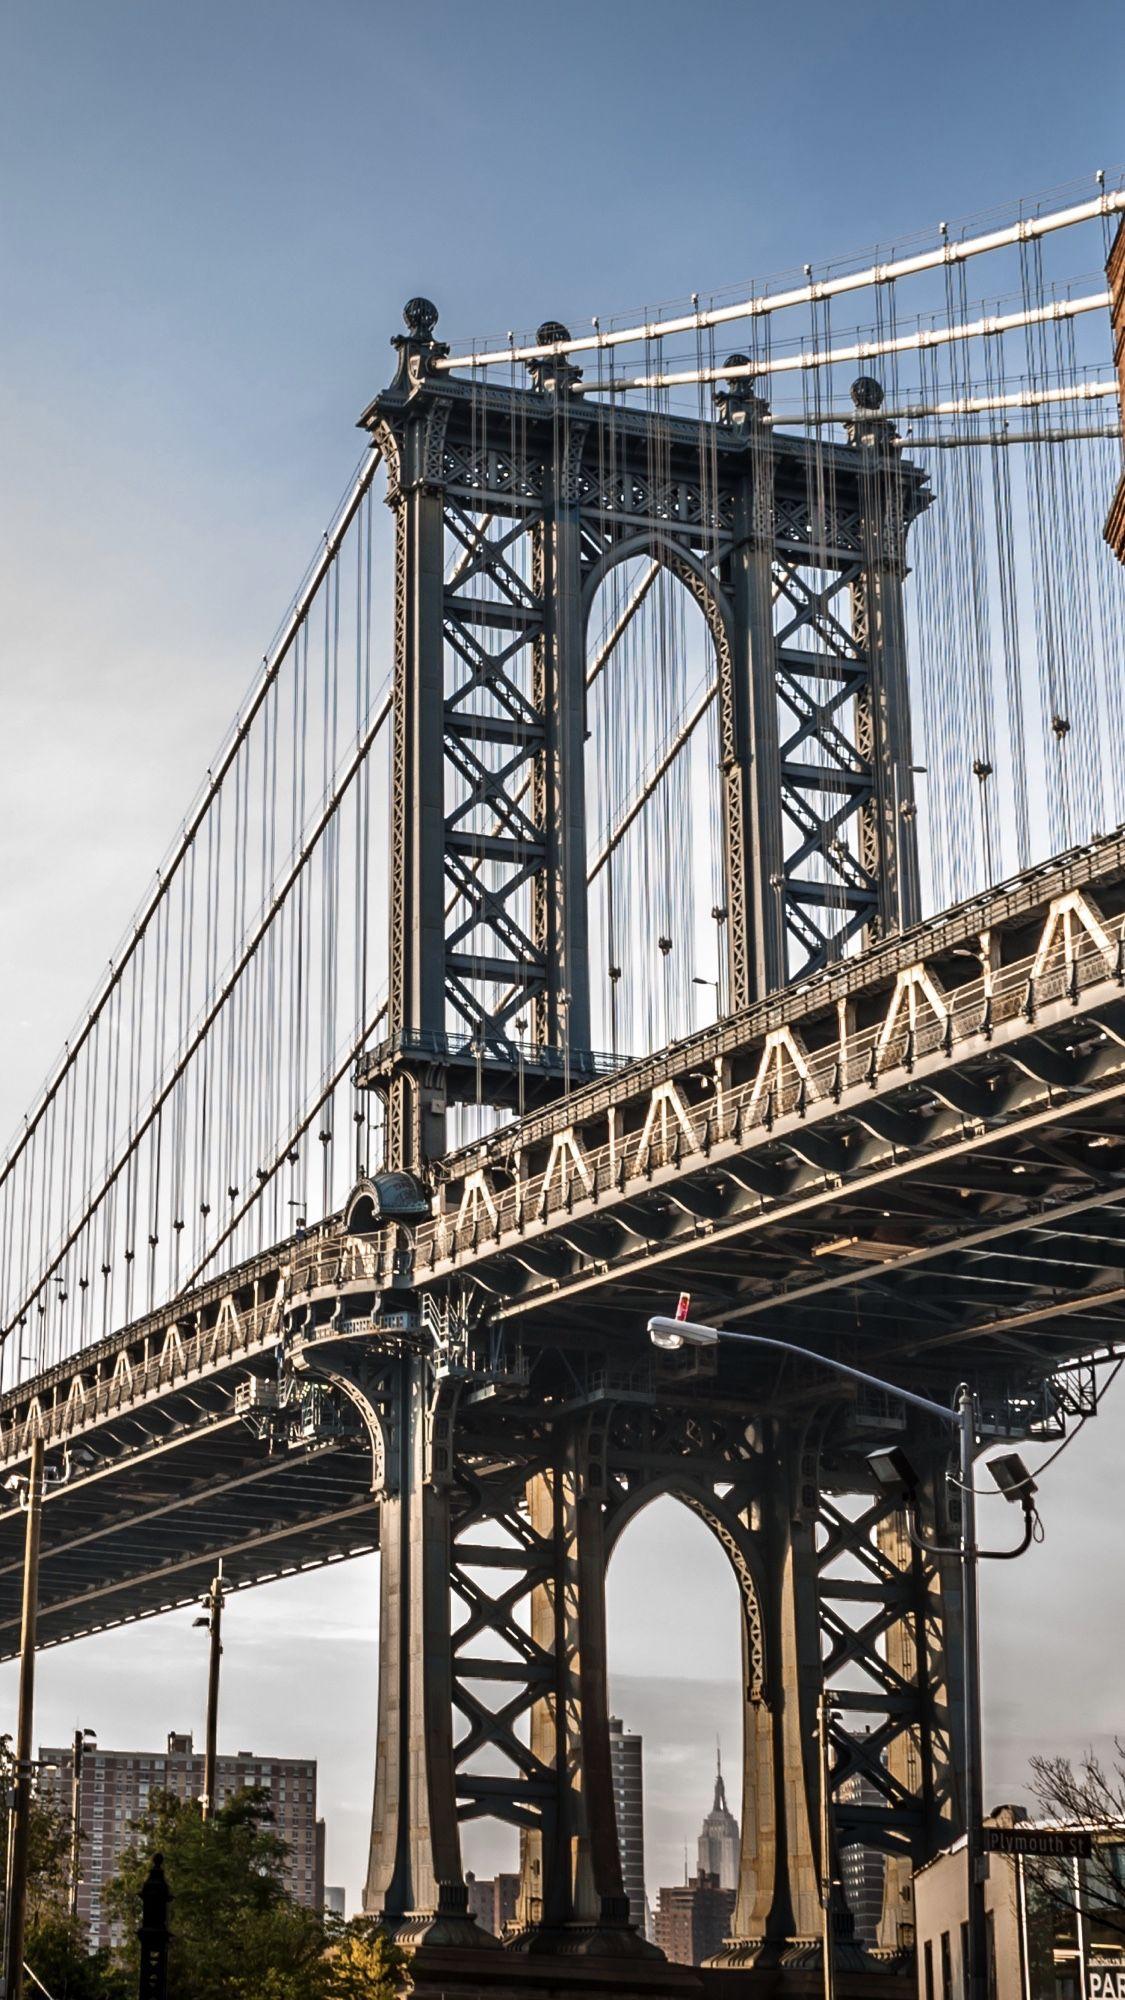 Brooklyn Bridge 🌉 in 2020 Cool wallpaper, Iphone 8